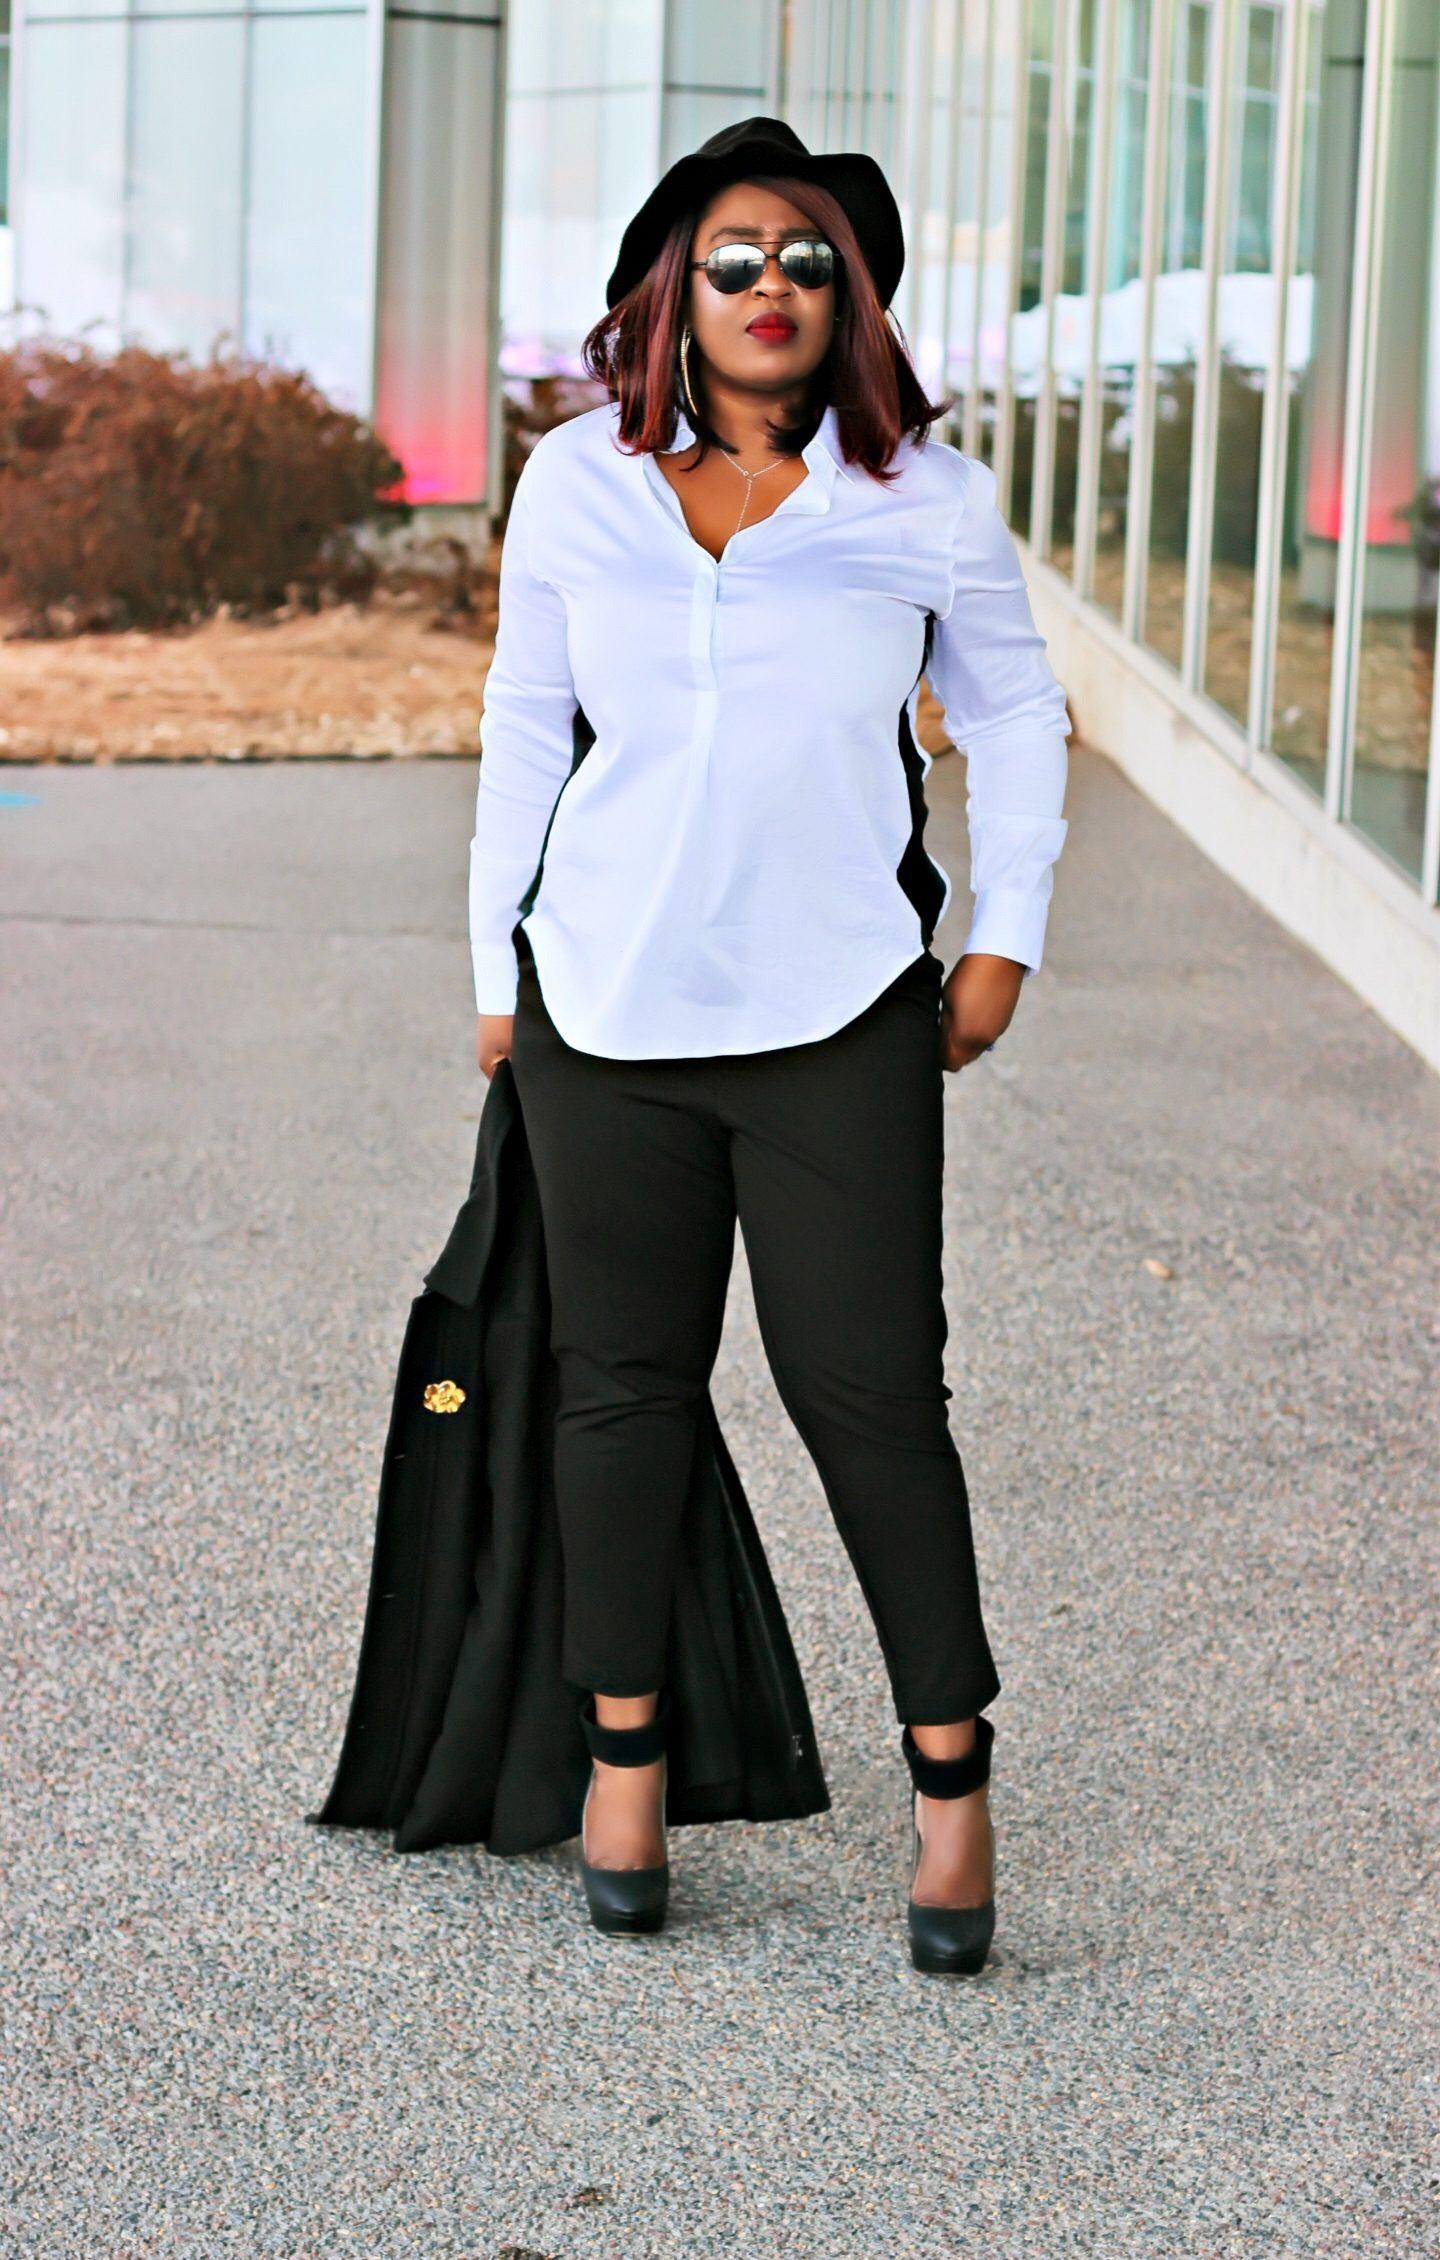 Black-blogger-in-white-and-black